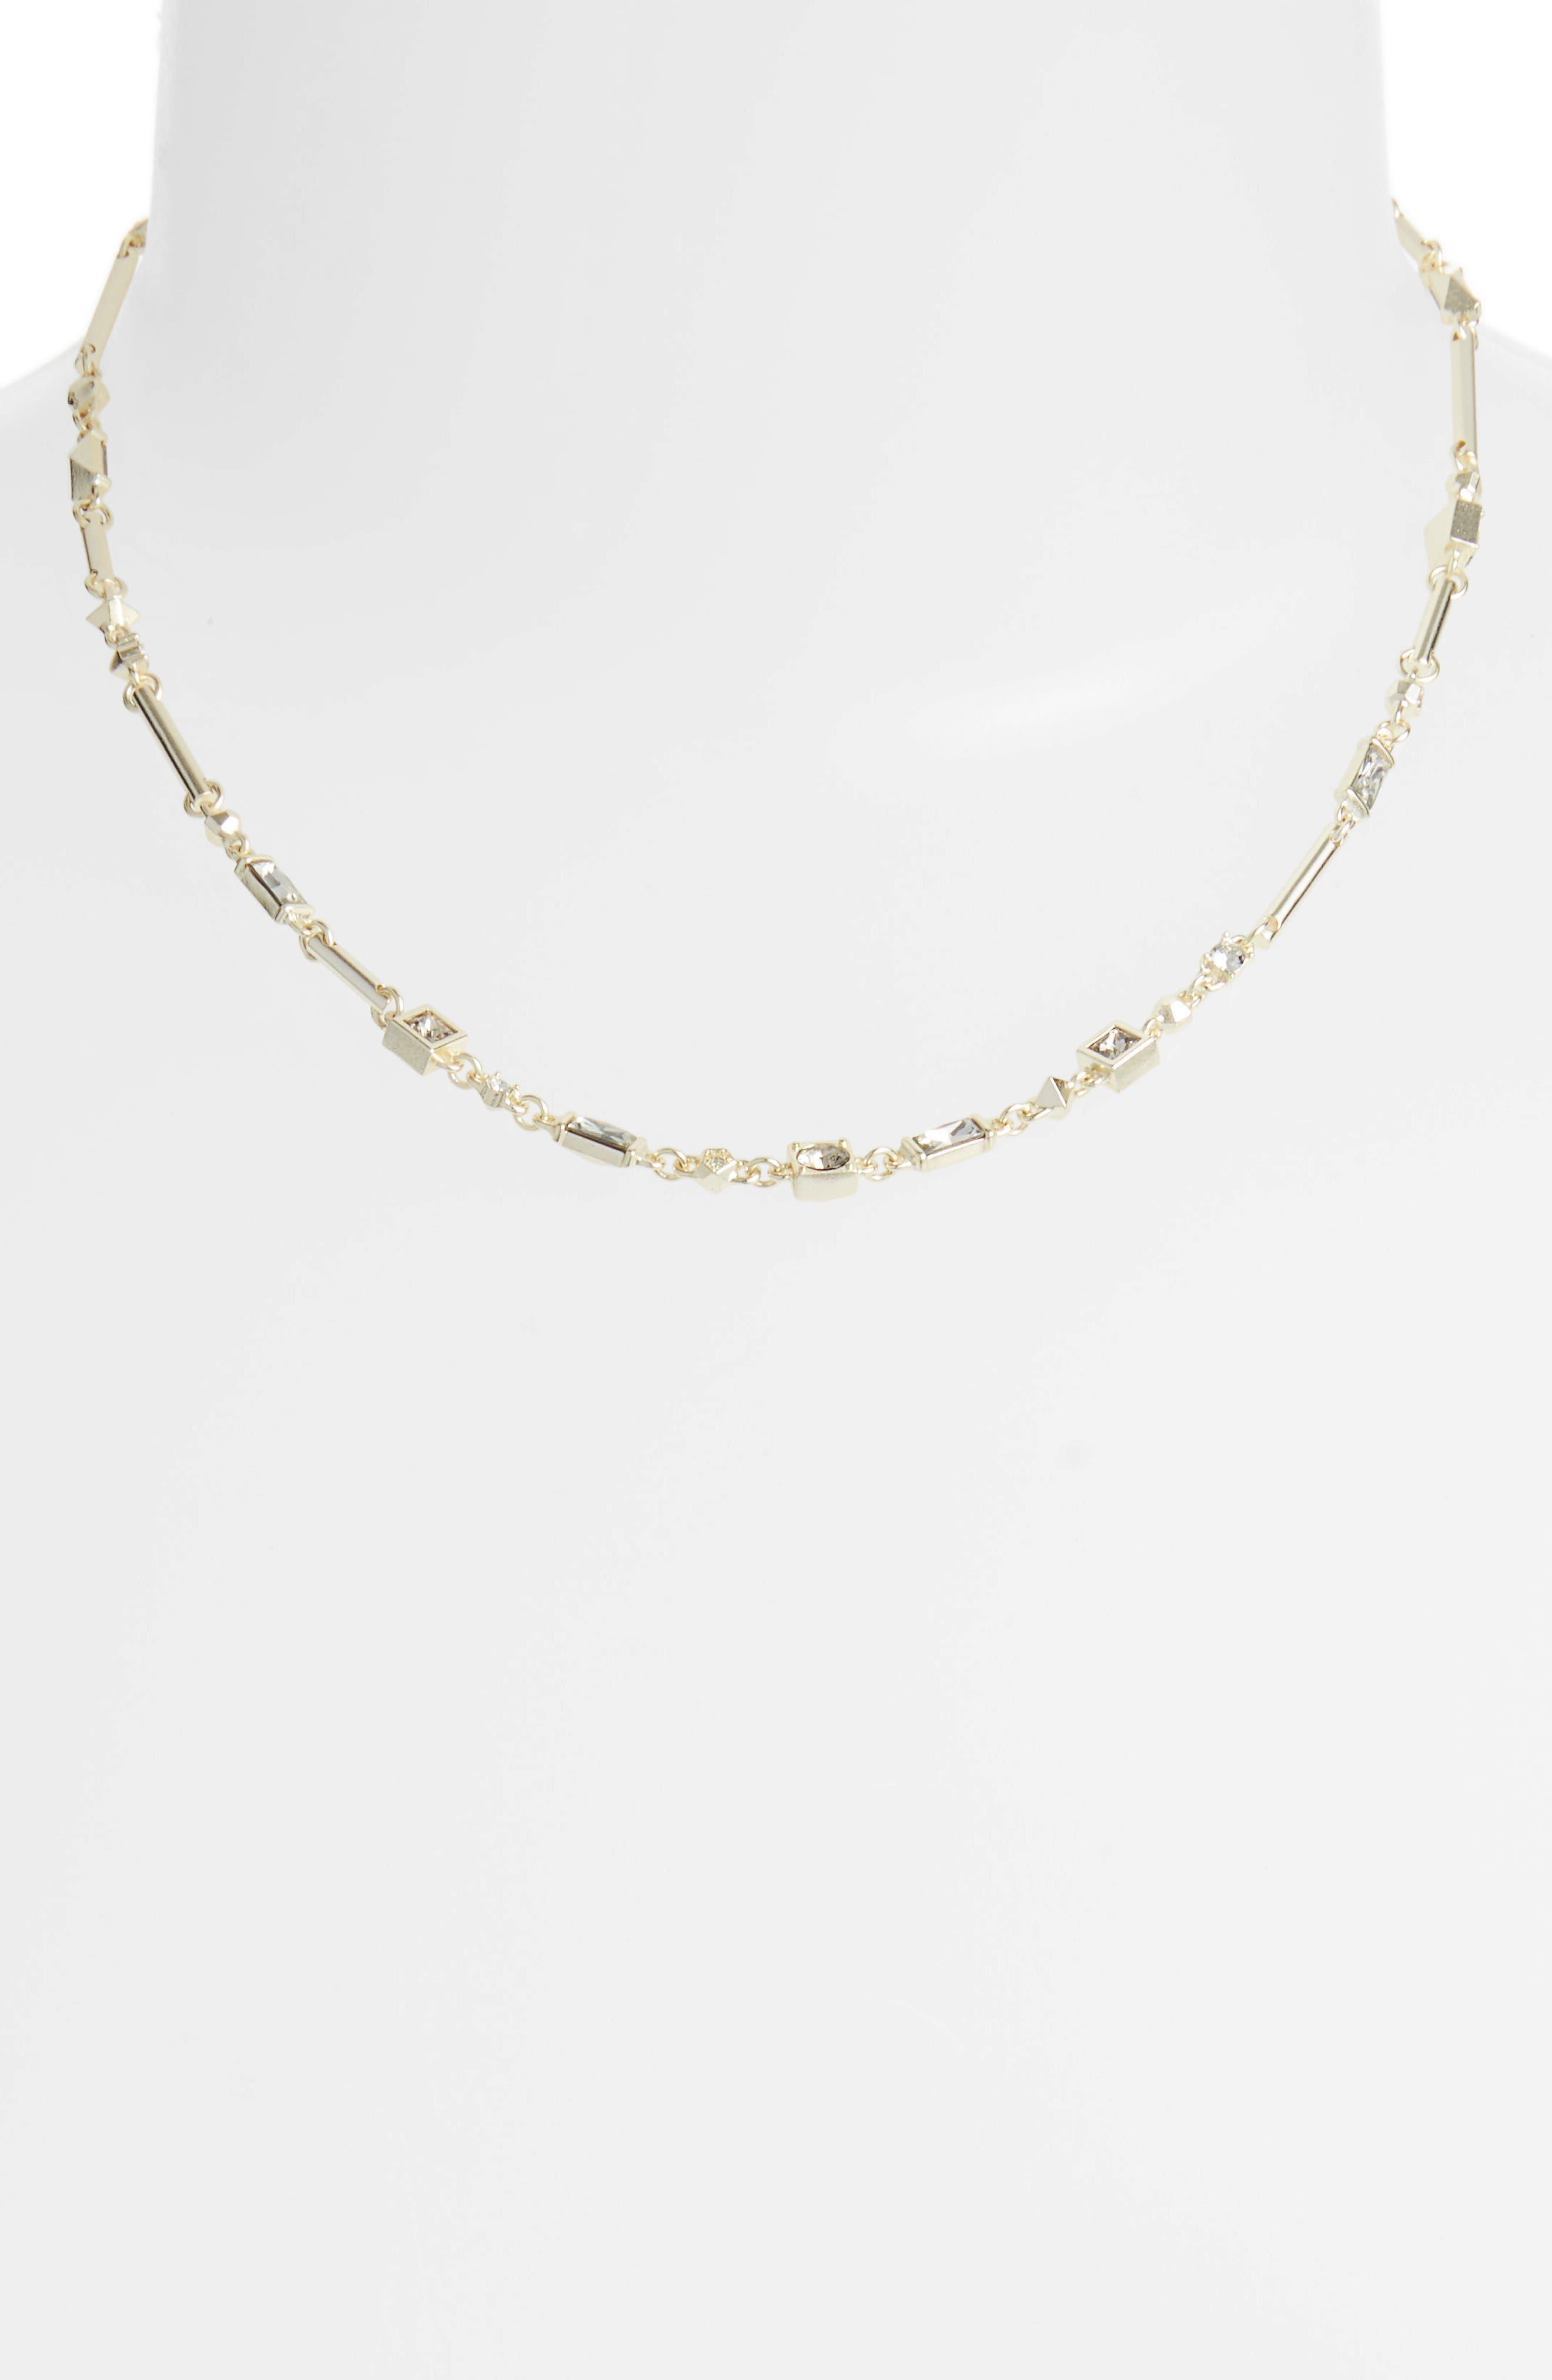 Rhett Collar Necklace,                             Alternate thumbnail 2, color,                             SMOKY MIX/ GOLD